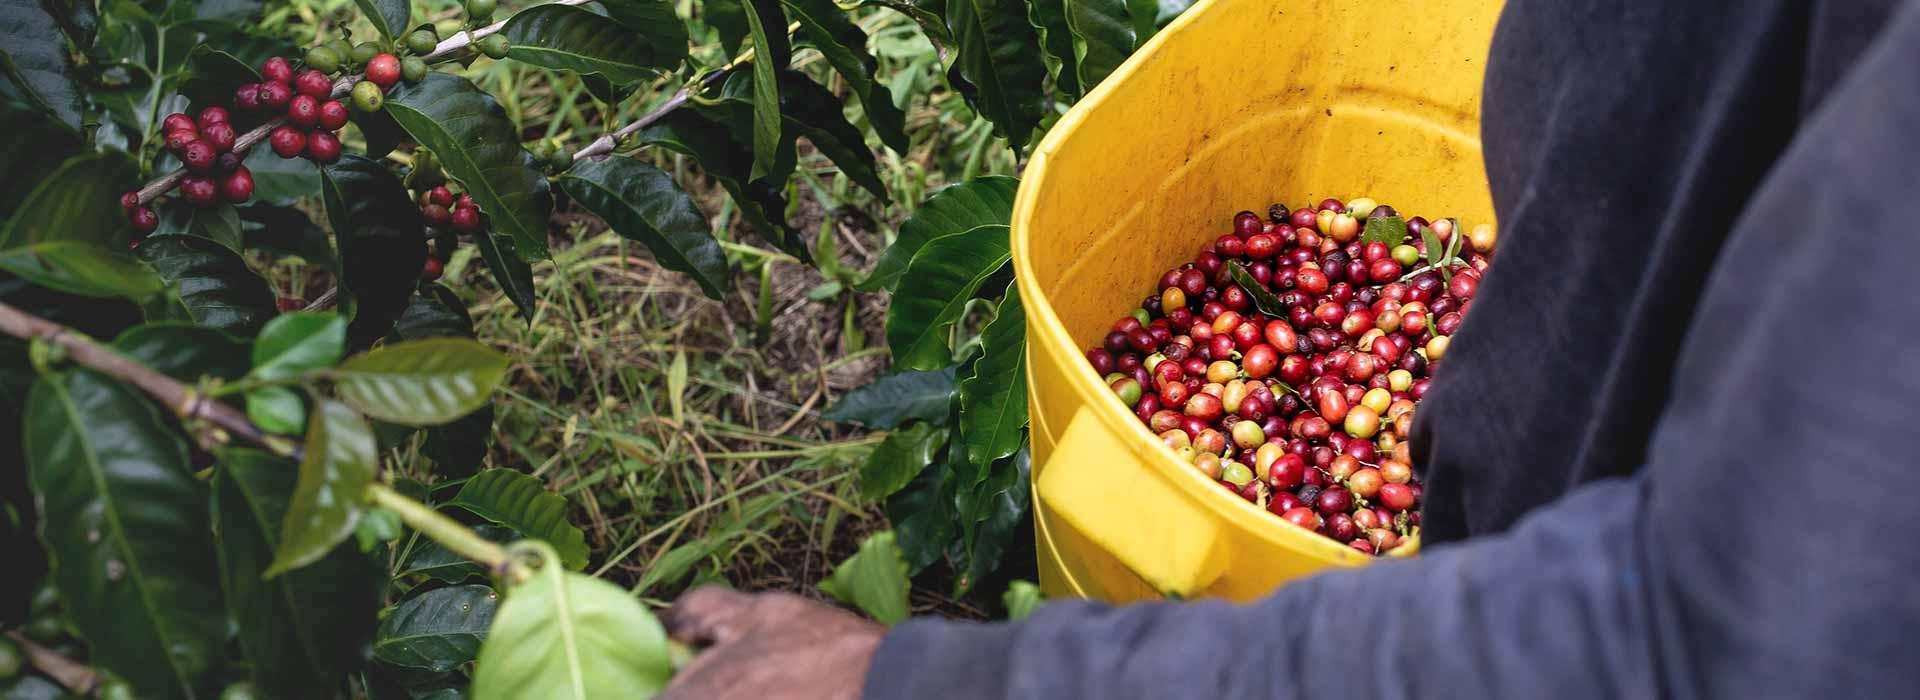 Über Kaffeeanbau und Kaffeeernte